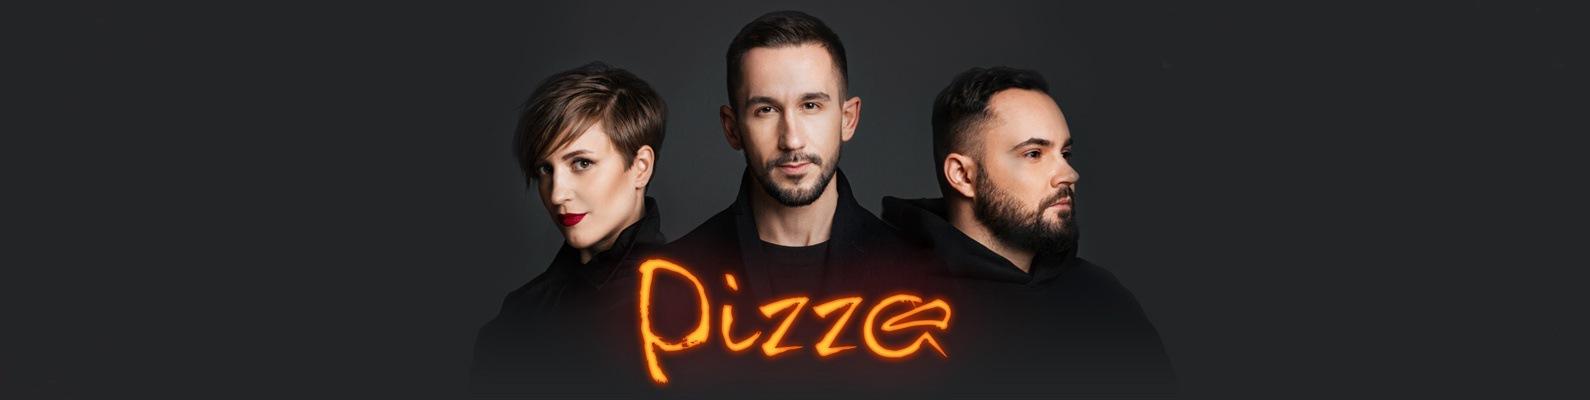 Пицца картинки группа